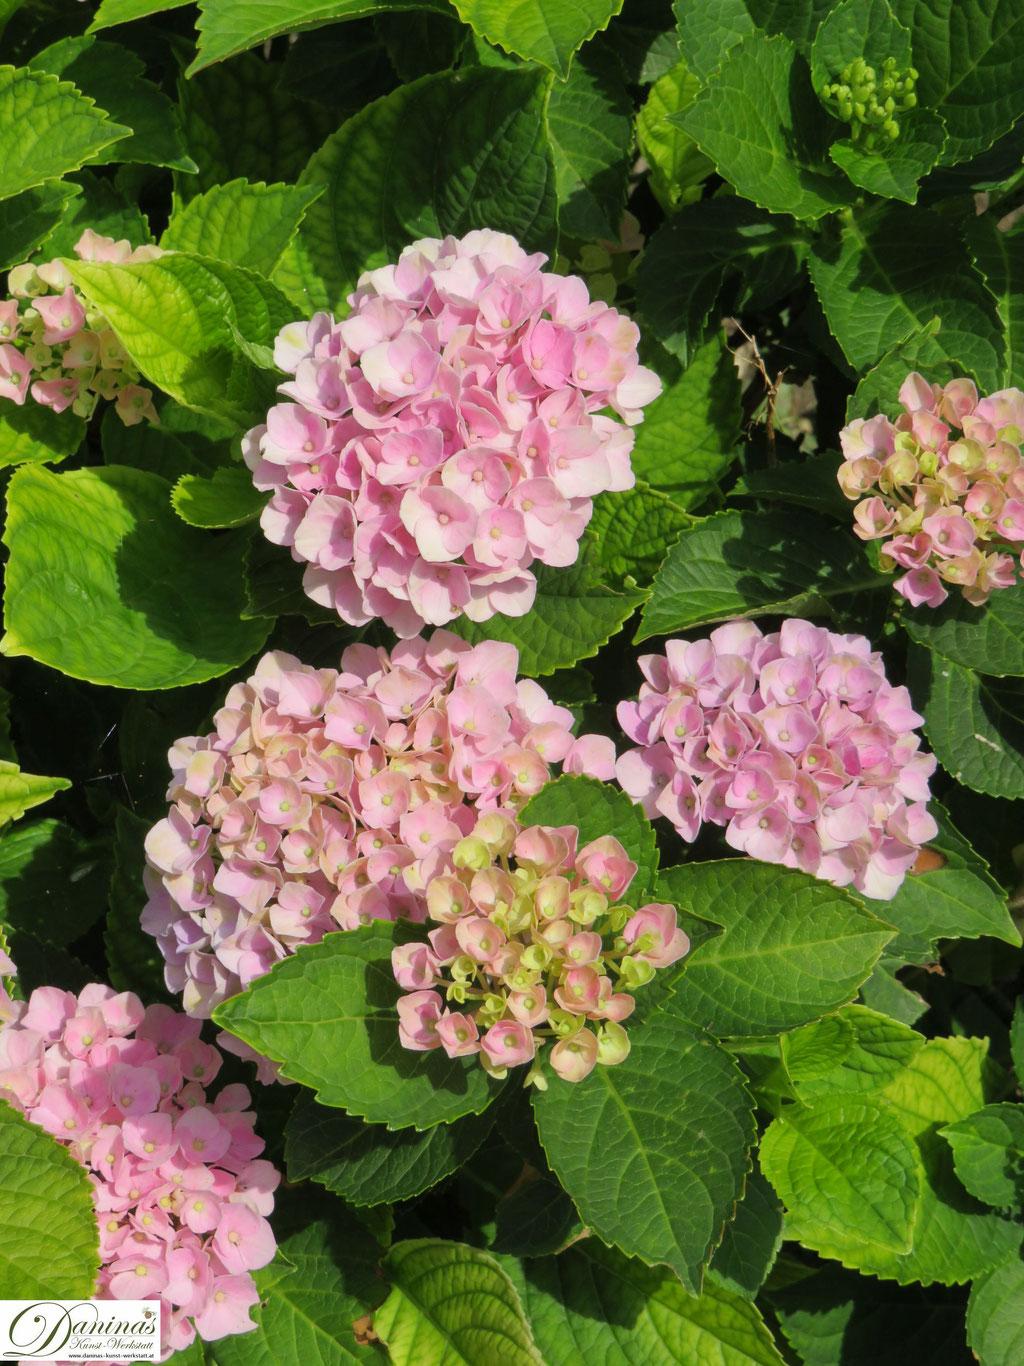 Rosa Hortensienblüten